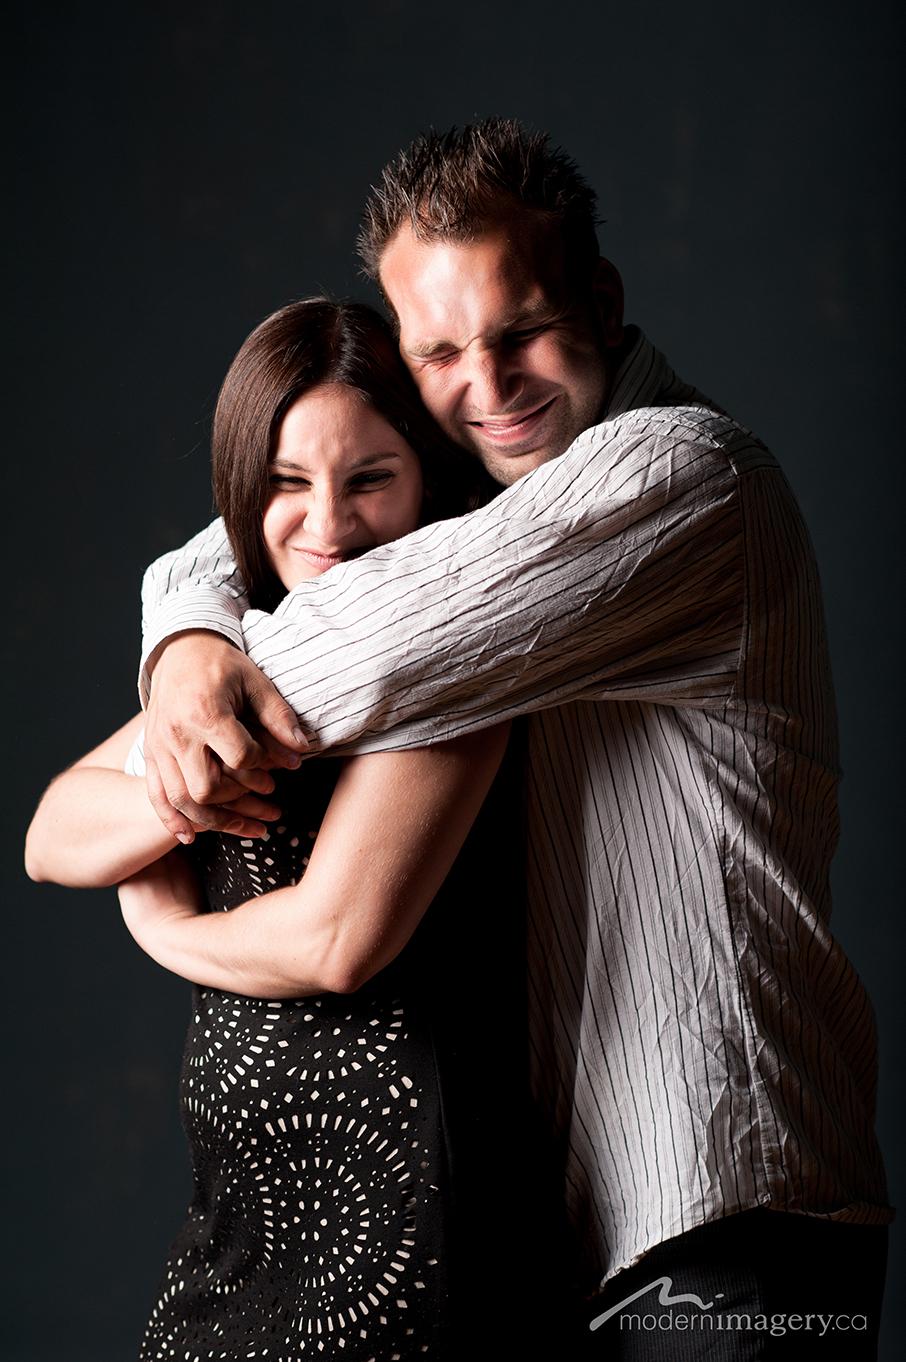 Rita&Tomasso-45.jpg